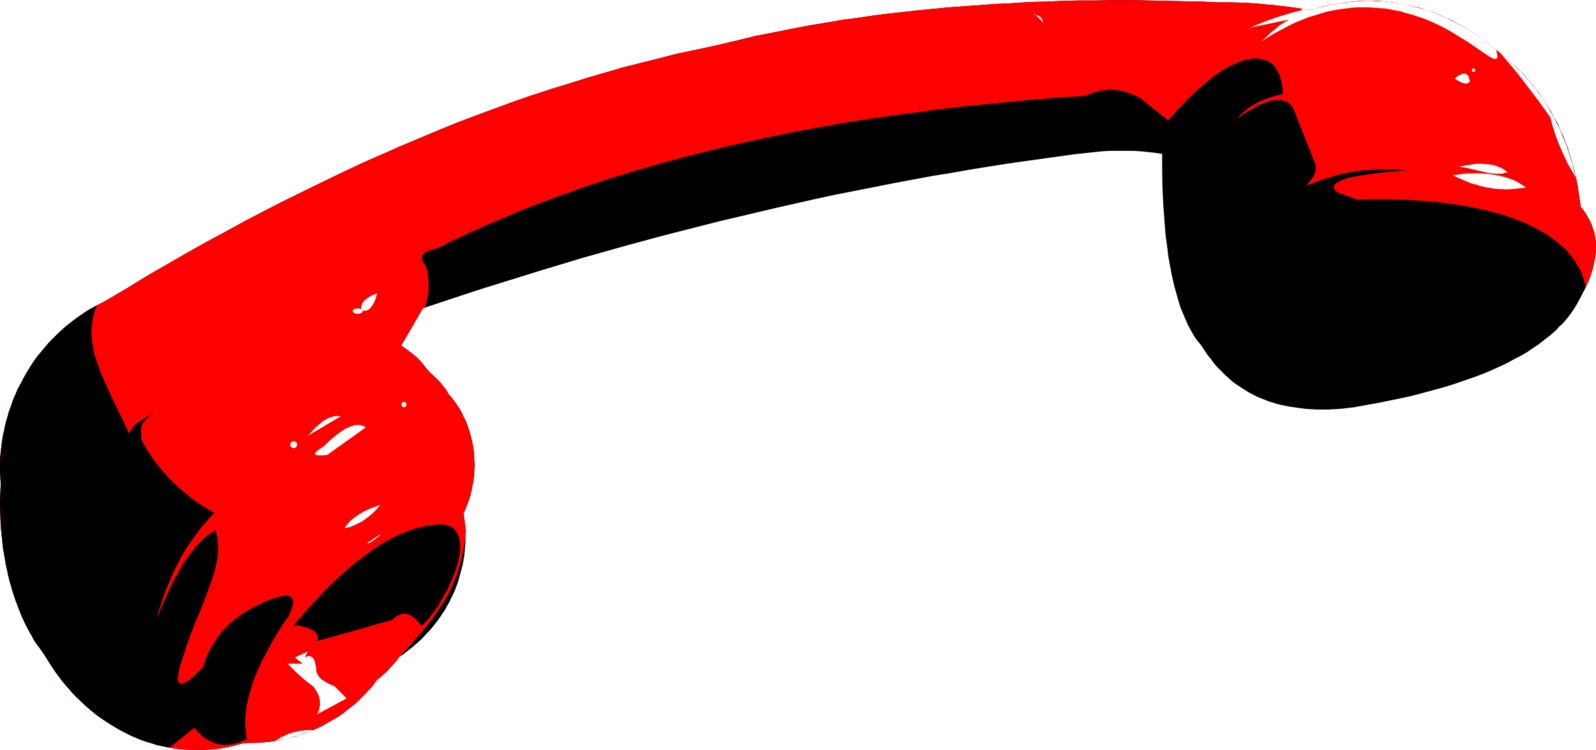 Red Lips PNG Images, Transparent Red Lips Image Download - PNGitem